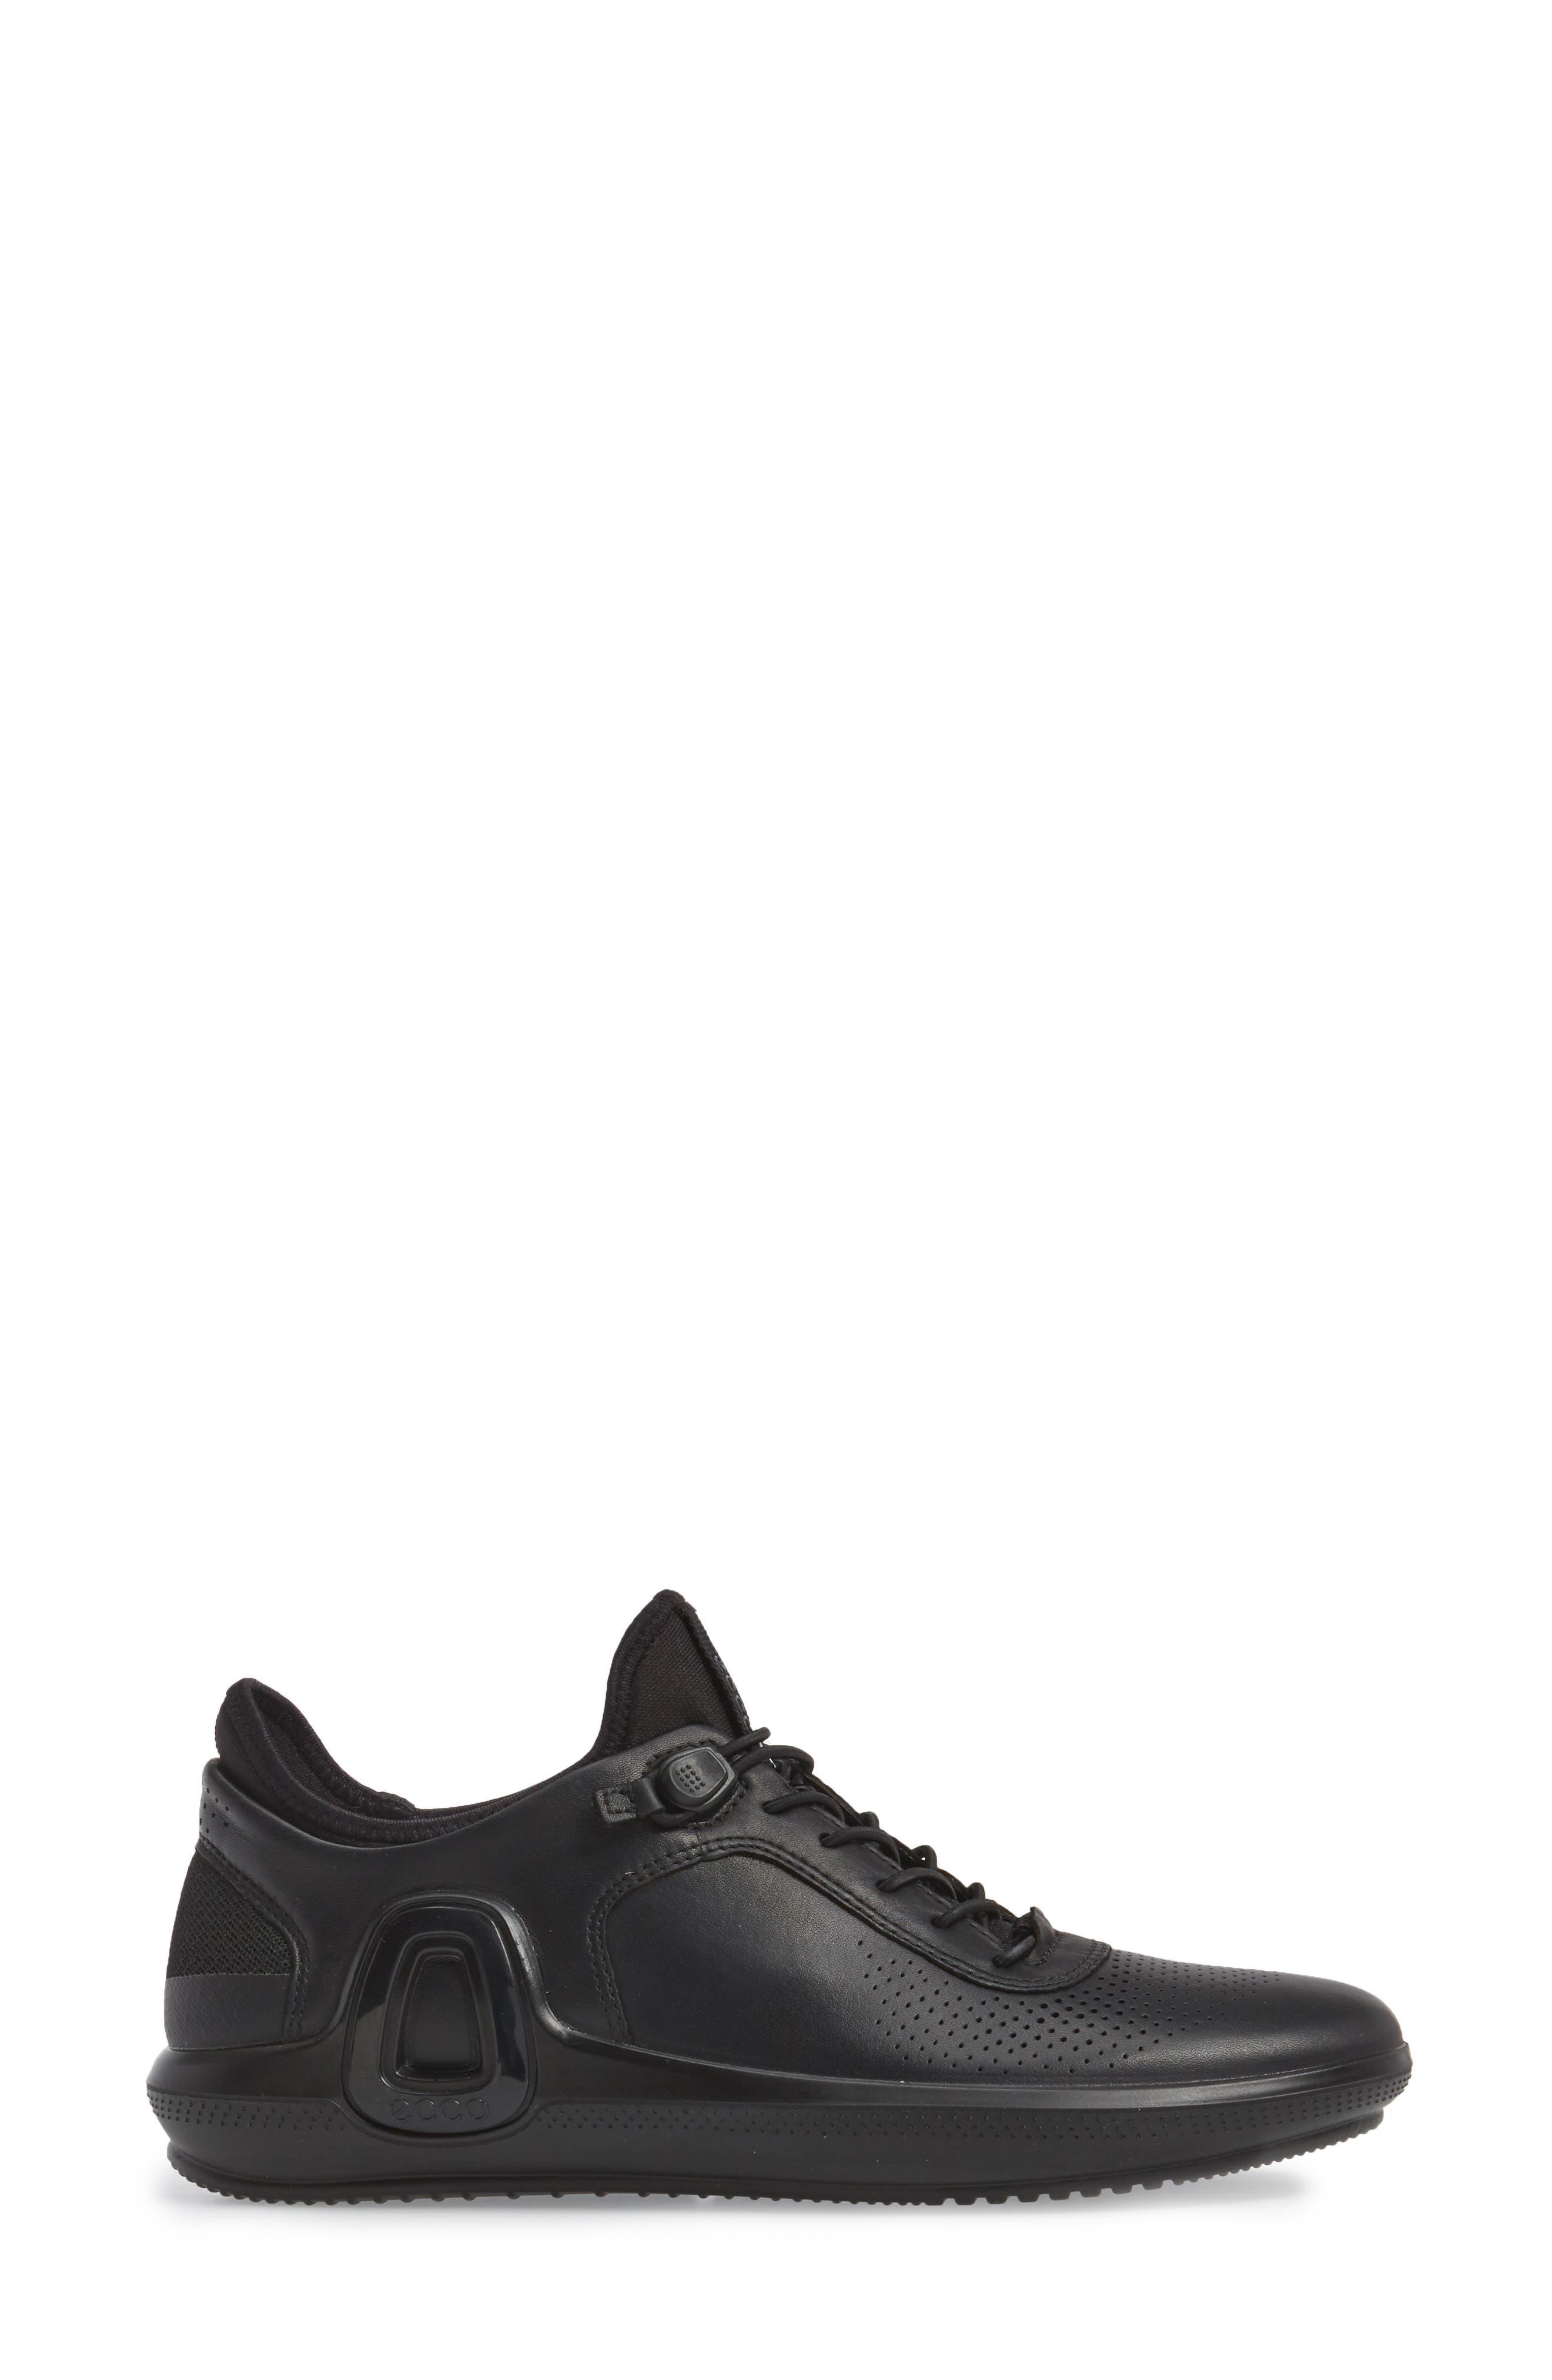 Intrinsic 3 Sneaker,                             Alternate thumbnail 3, color,                             002